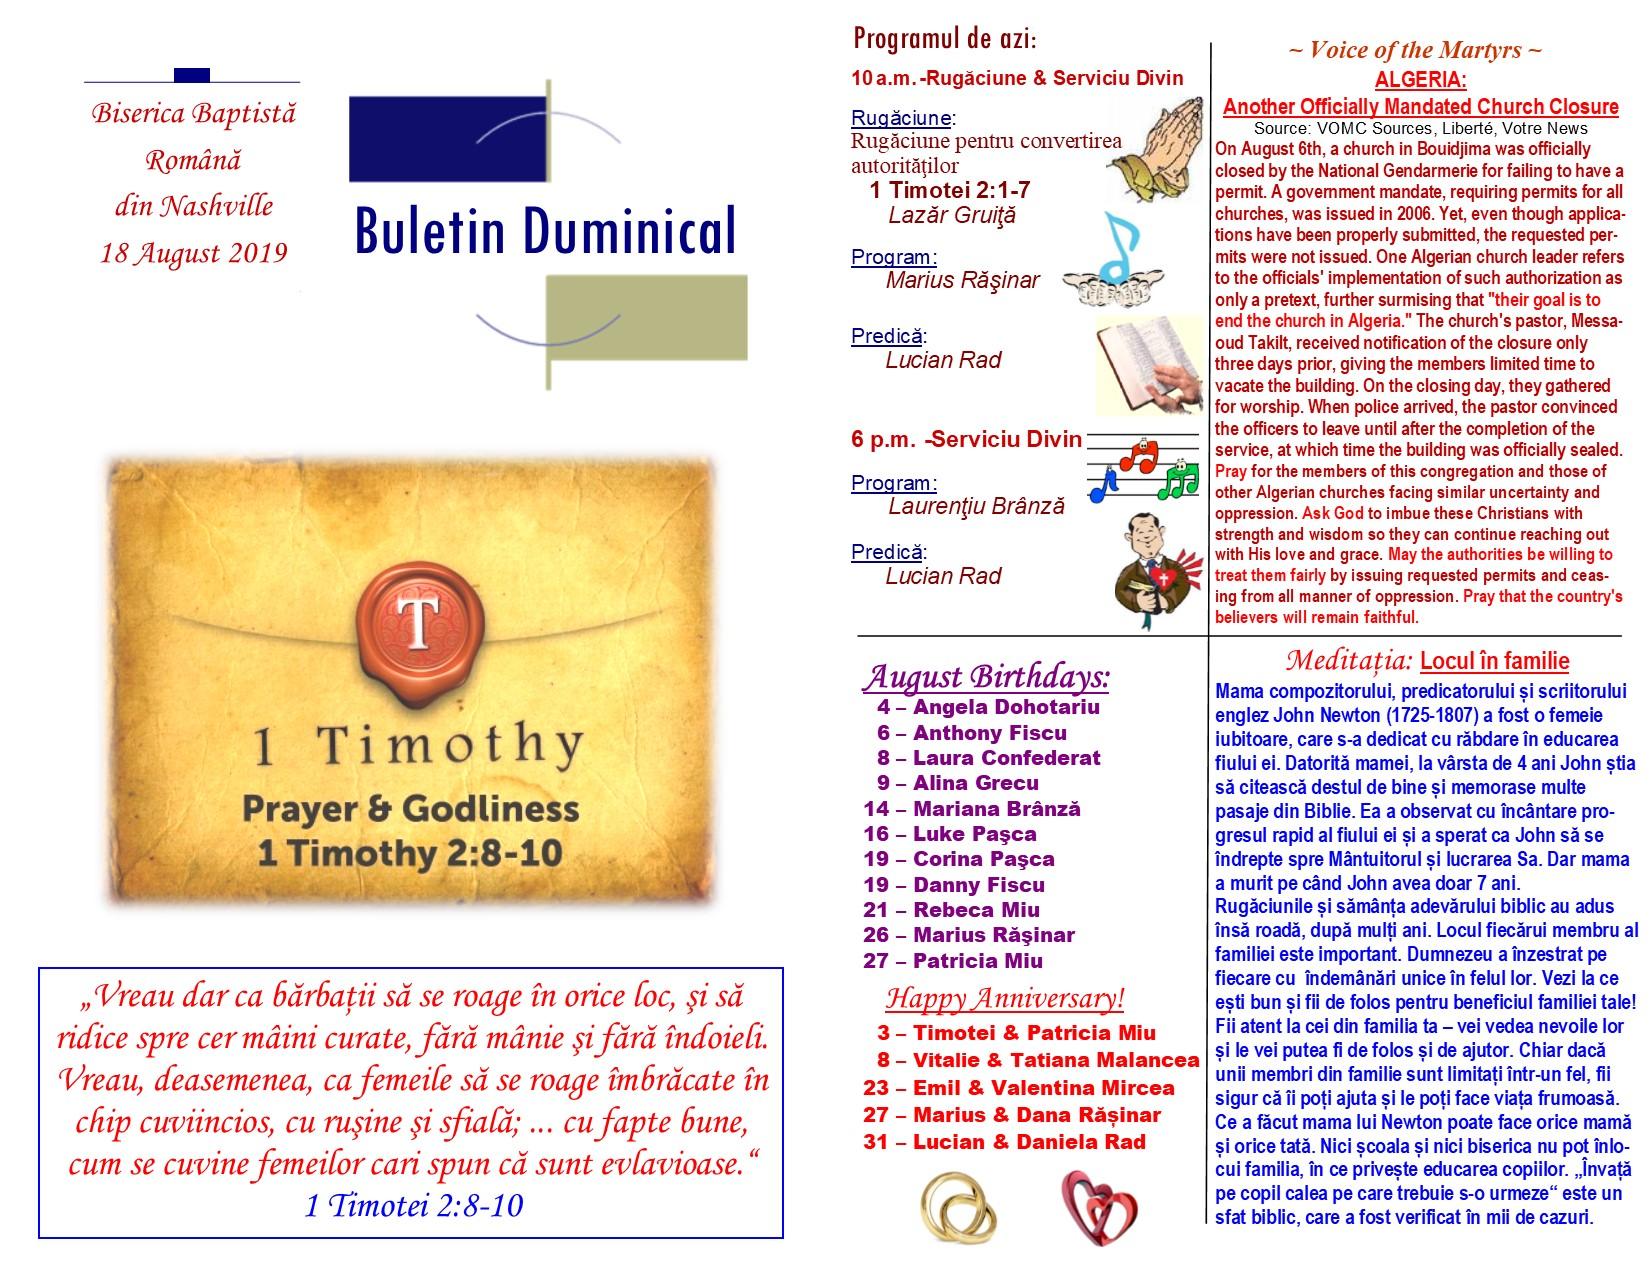 Buletin 08-18-19 page 1 & 2